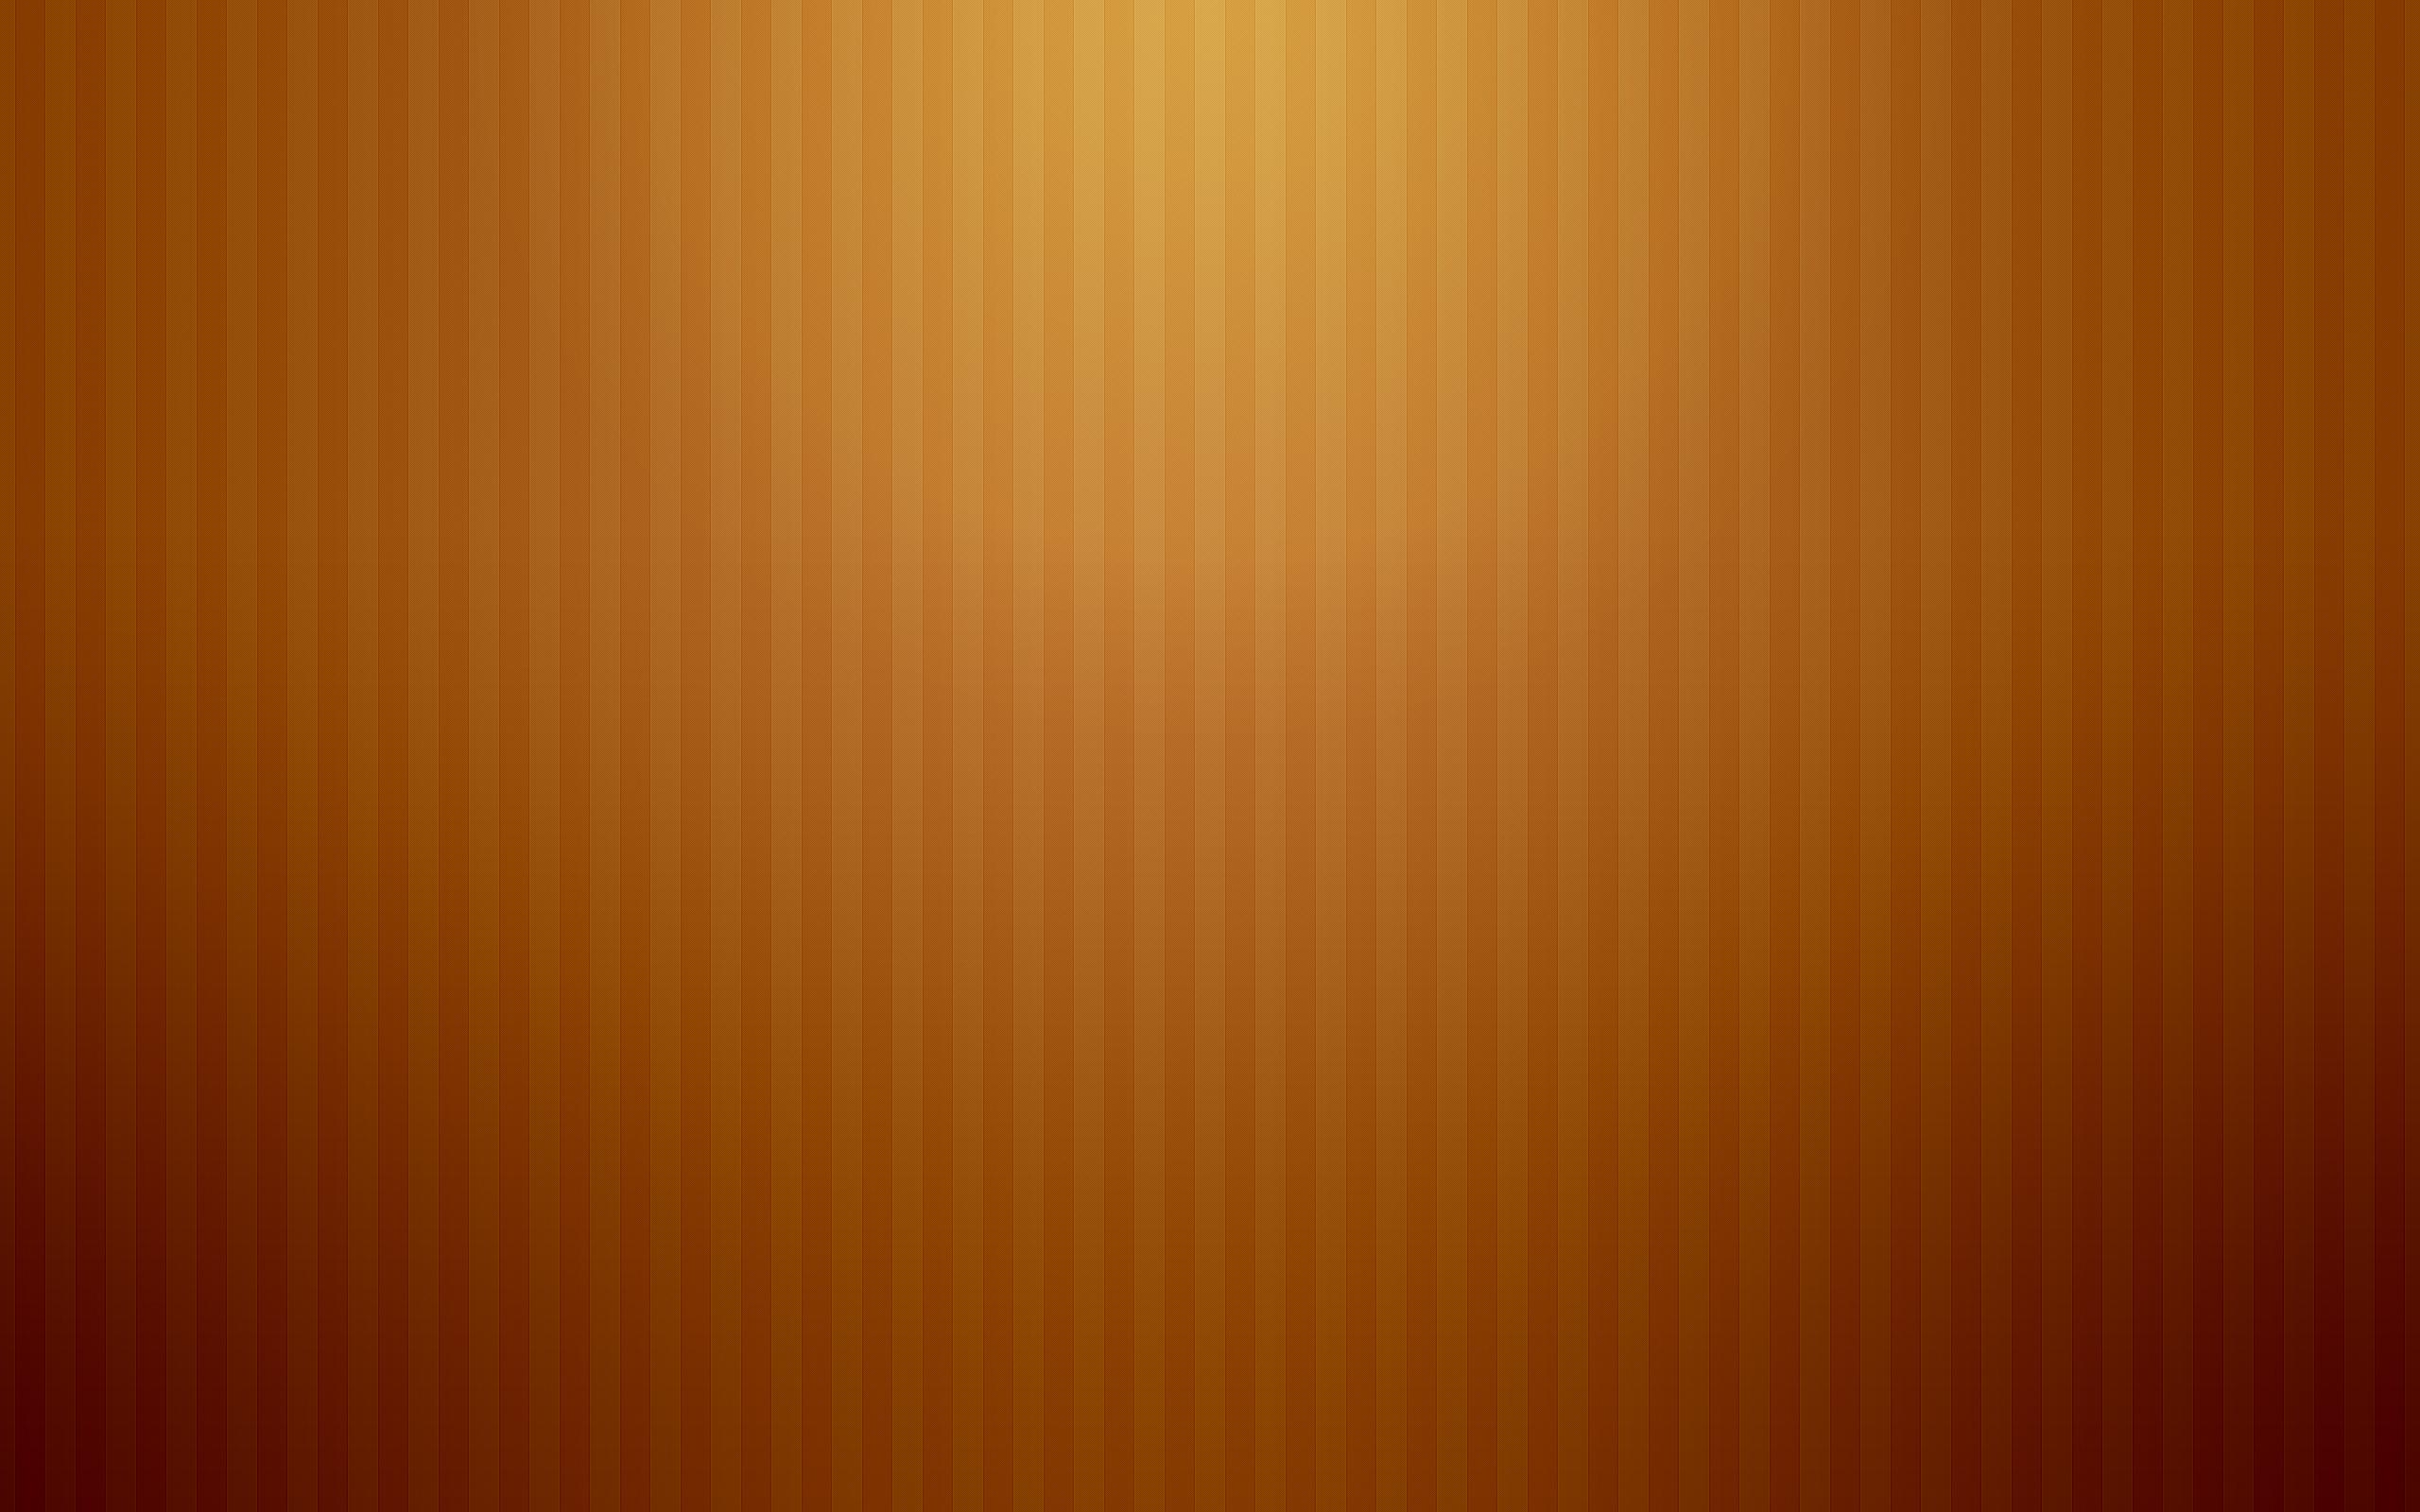 Orange Wallpaper Texture Orange pattern 2560x1600